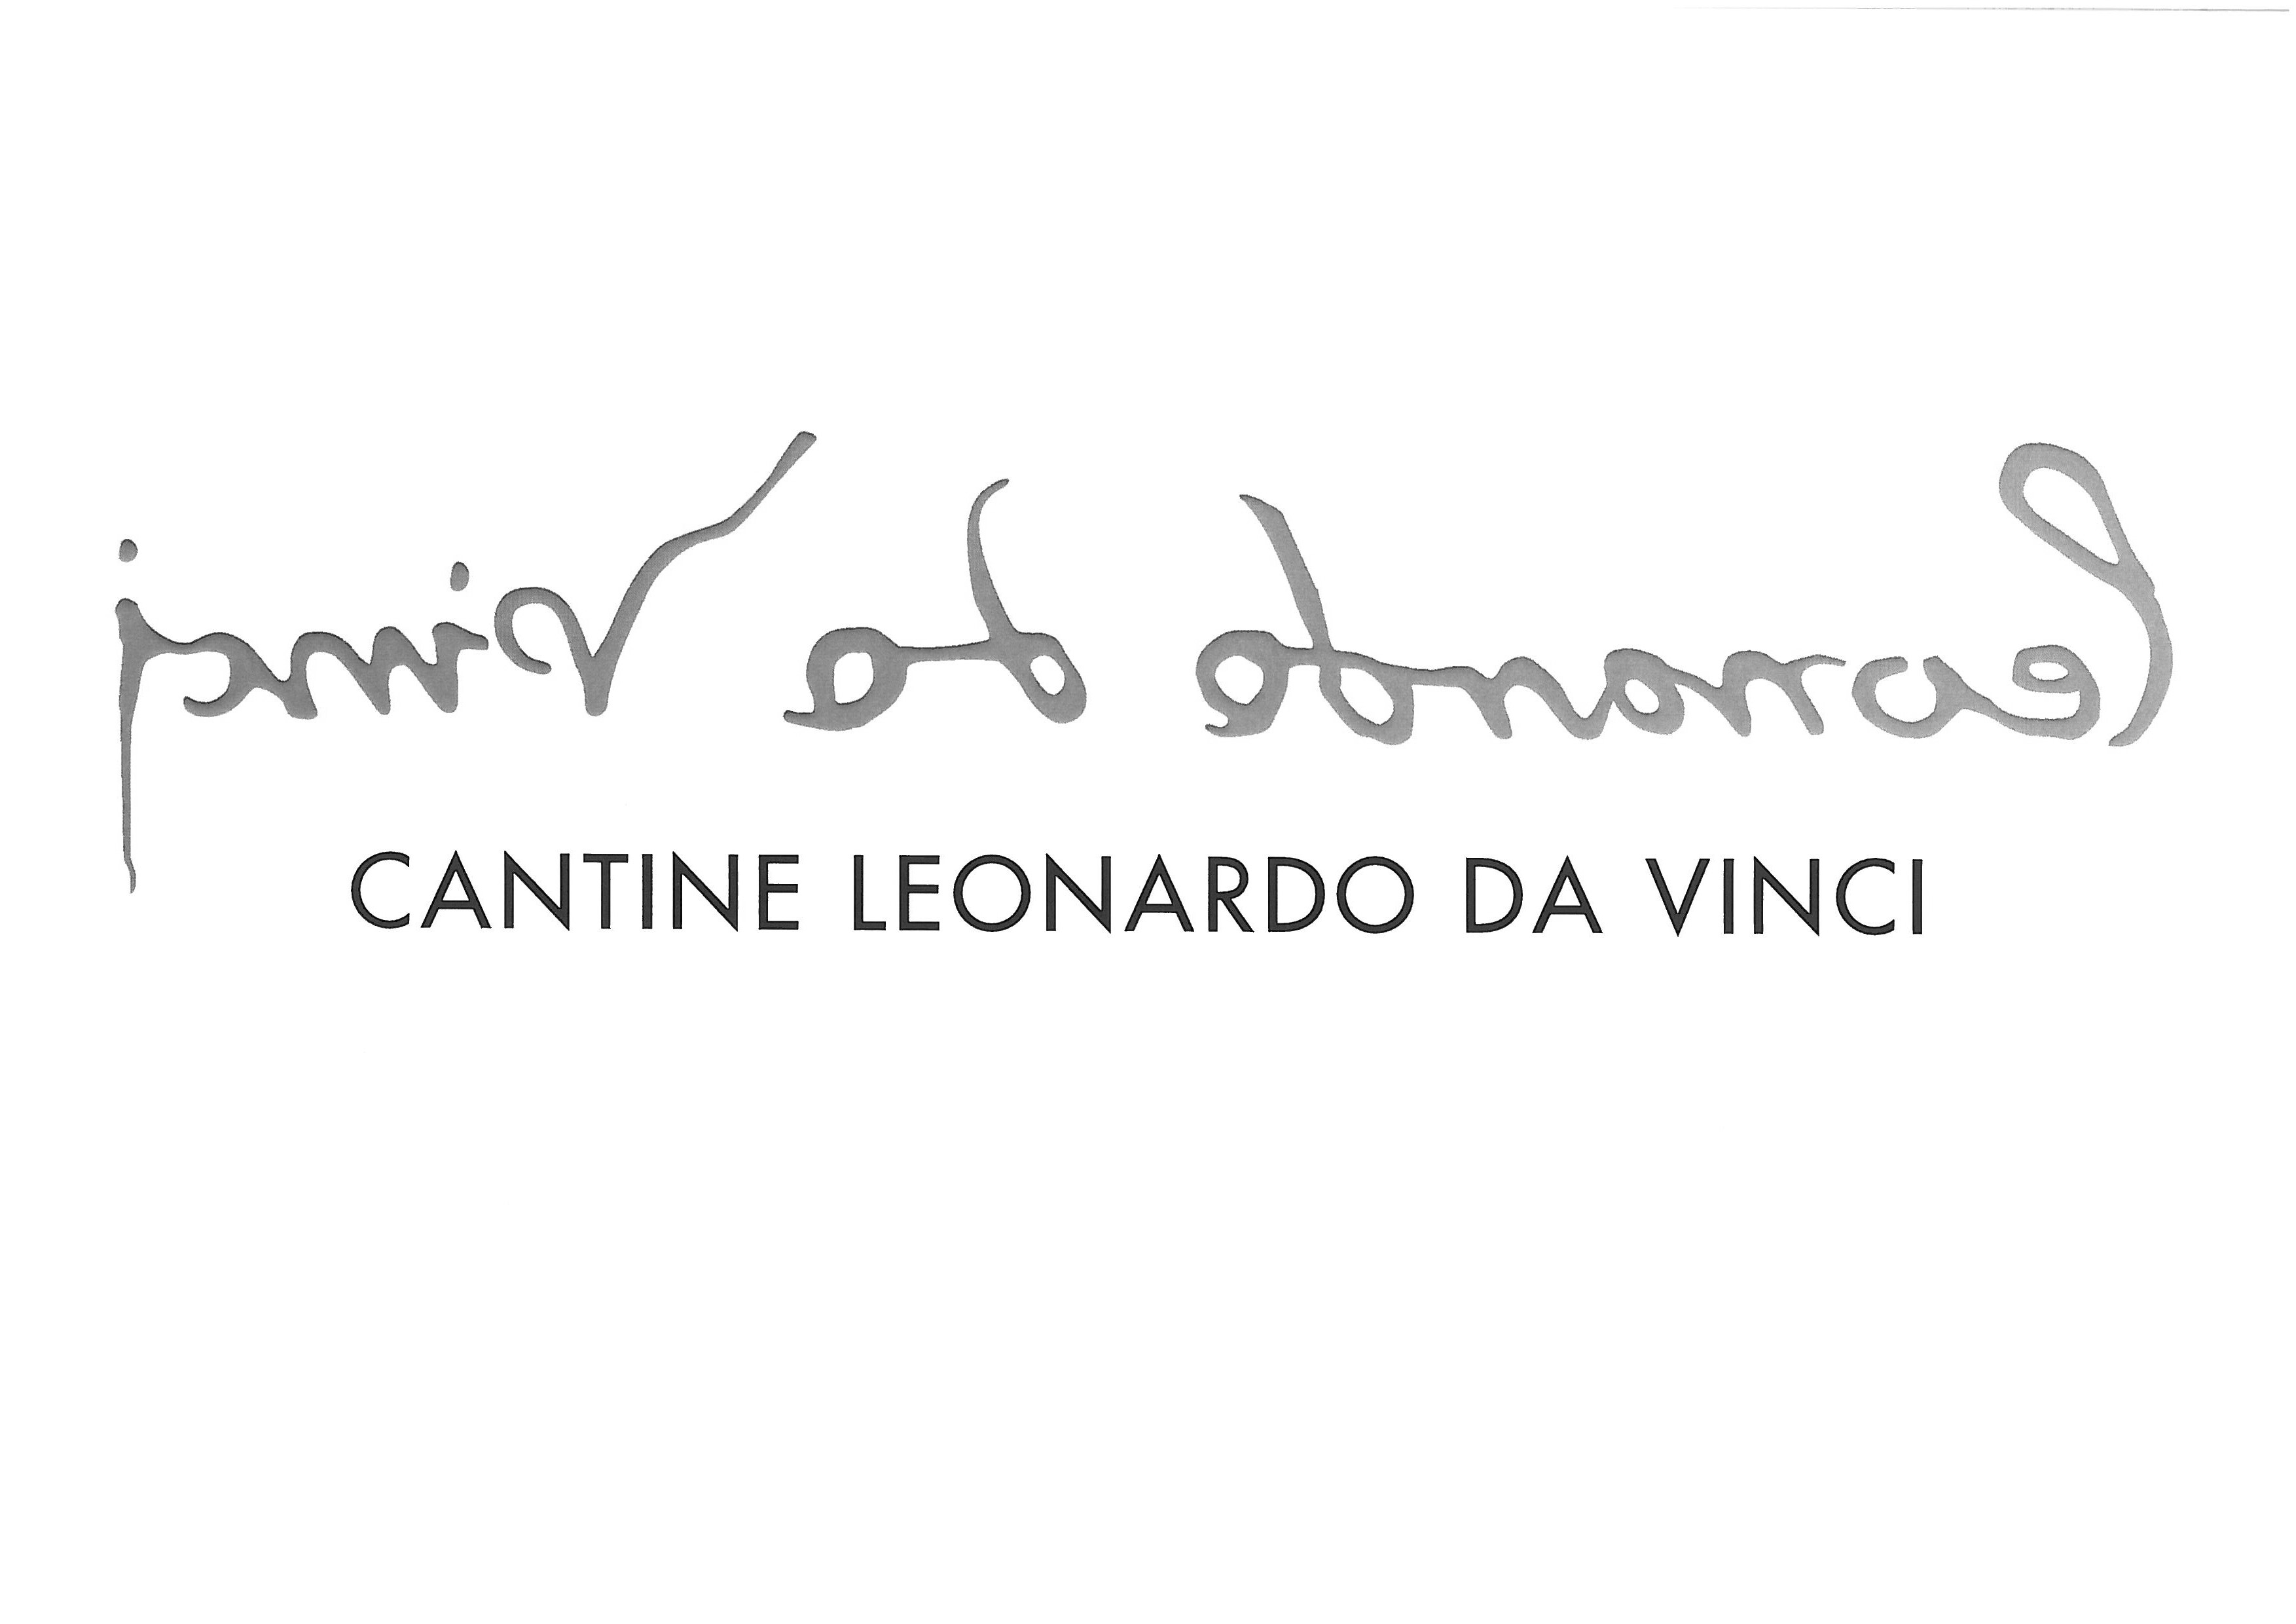 Cantine Leonardo